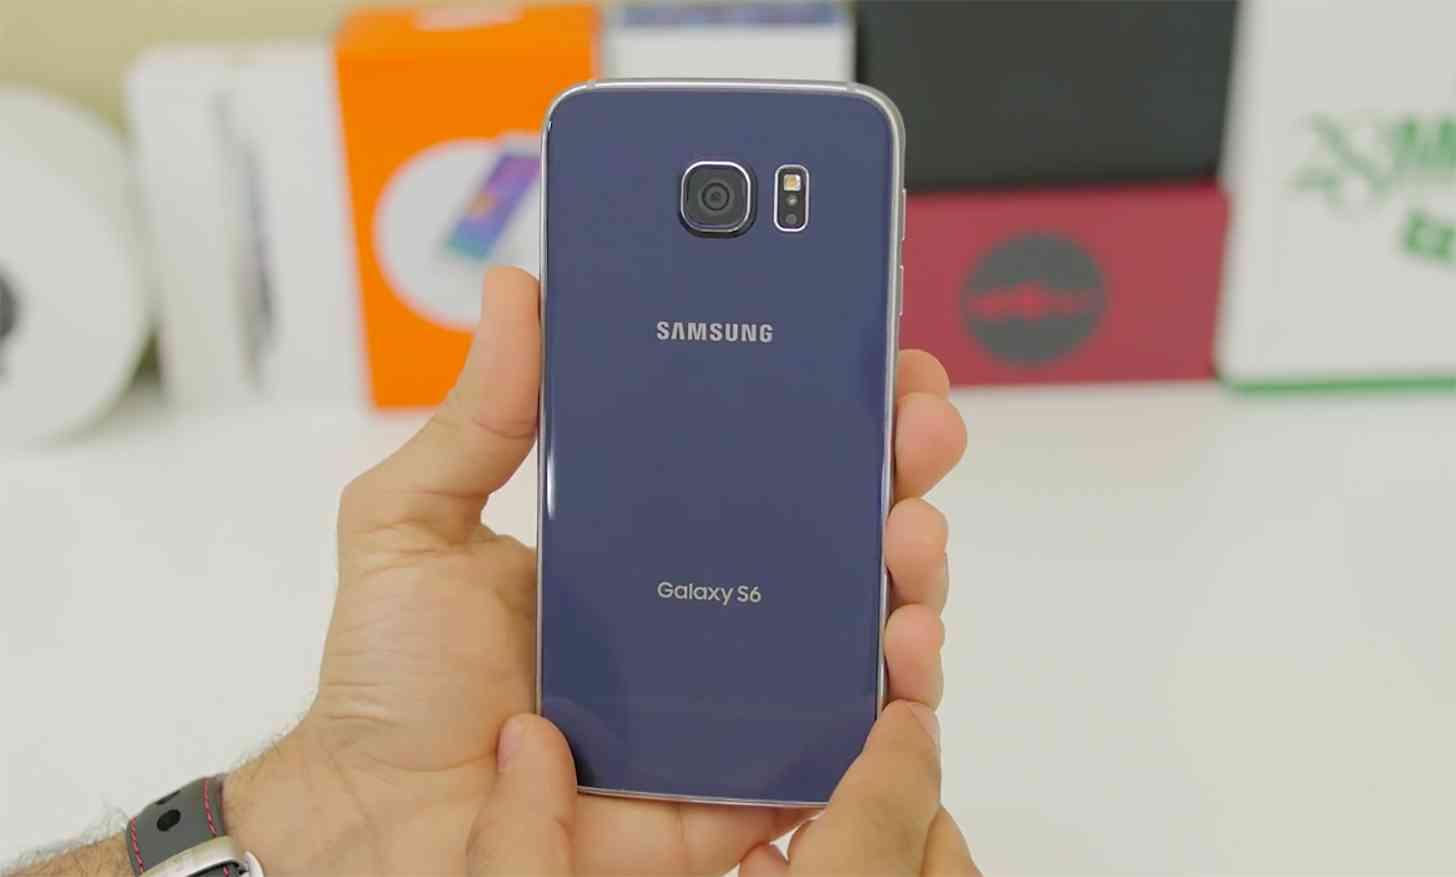 Samsung Galaxy S6 rear